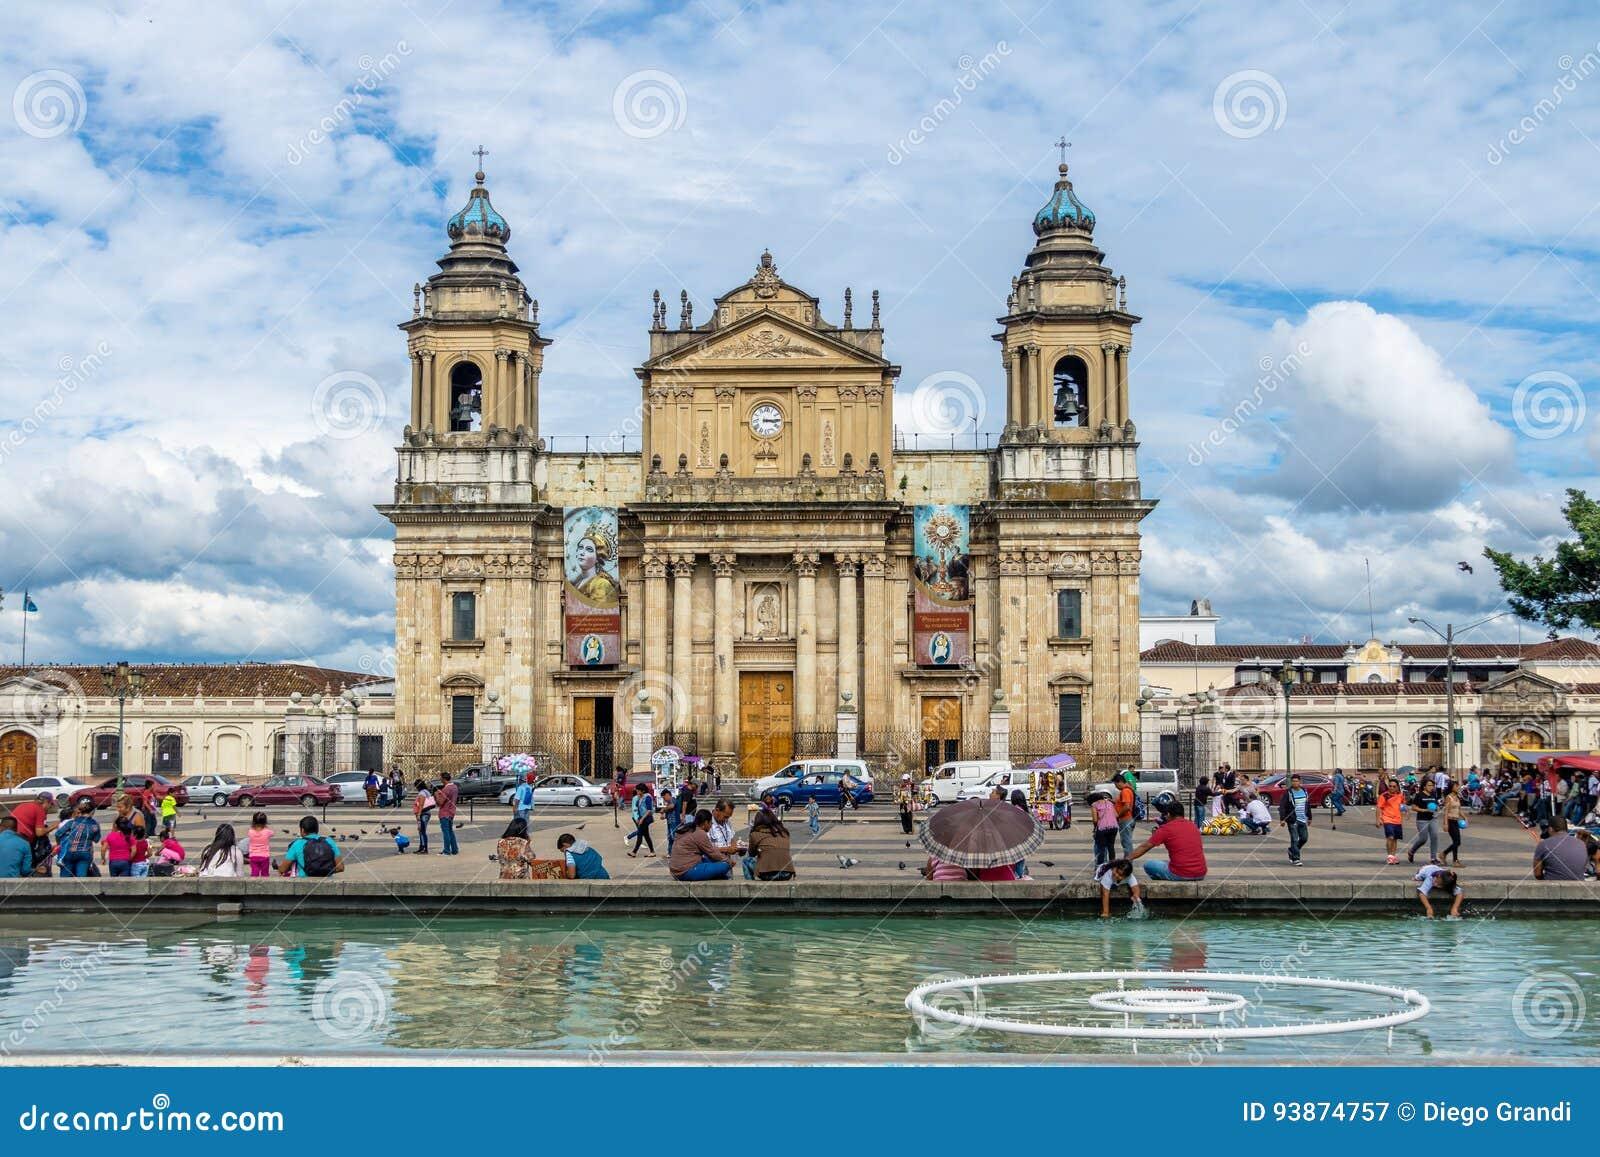 Catedral metropolitana de ciudad de Guatemala en el cuadrado ciudad de Guatemala, Guatemala de Plaza de la Constitucion Constitut